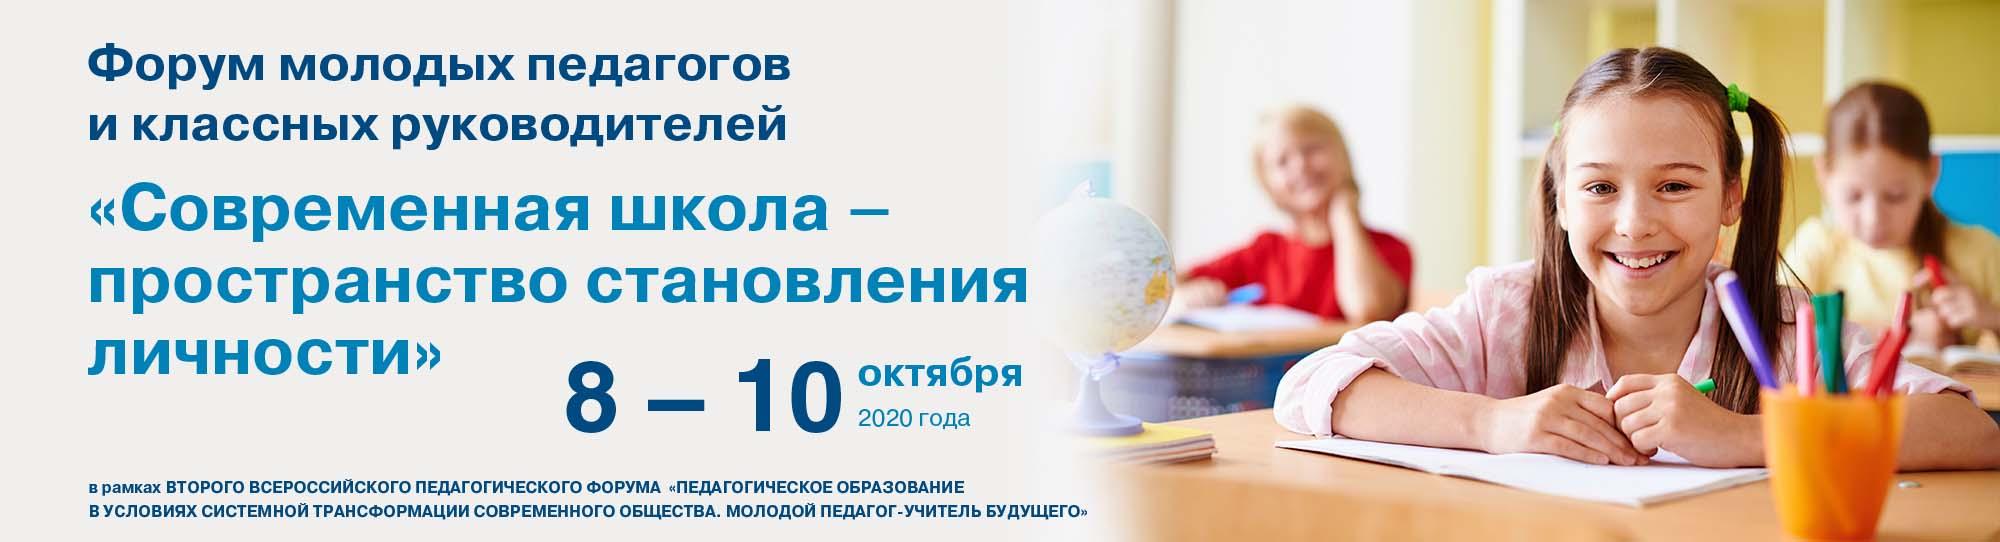 Баннер Форум молодых педагогов2020